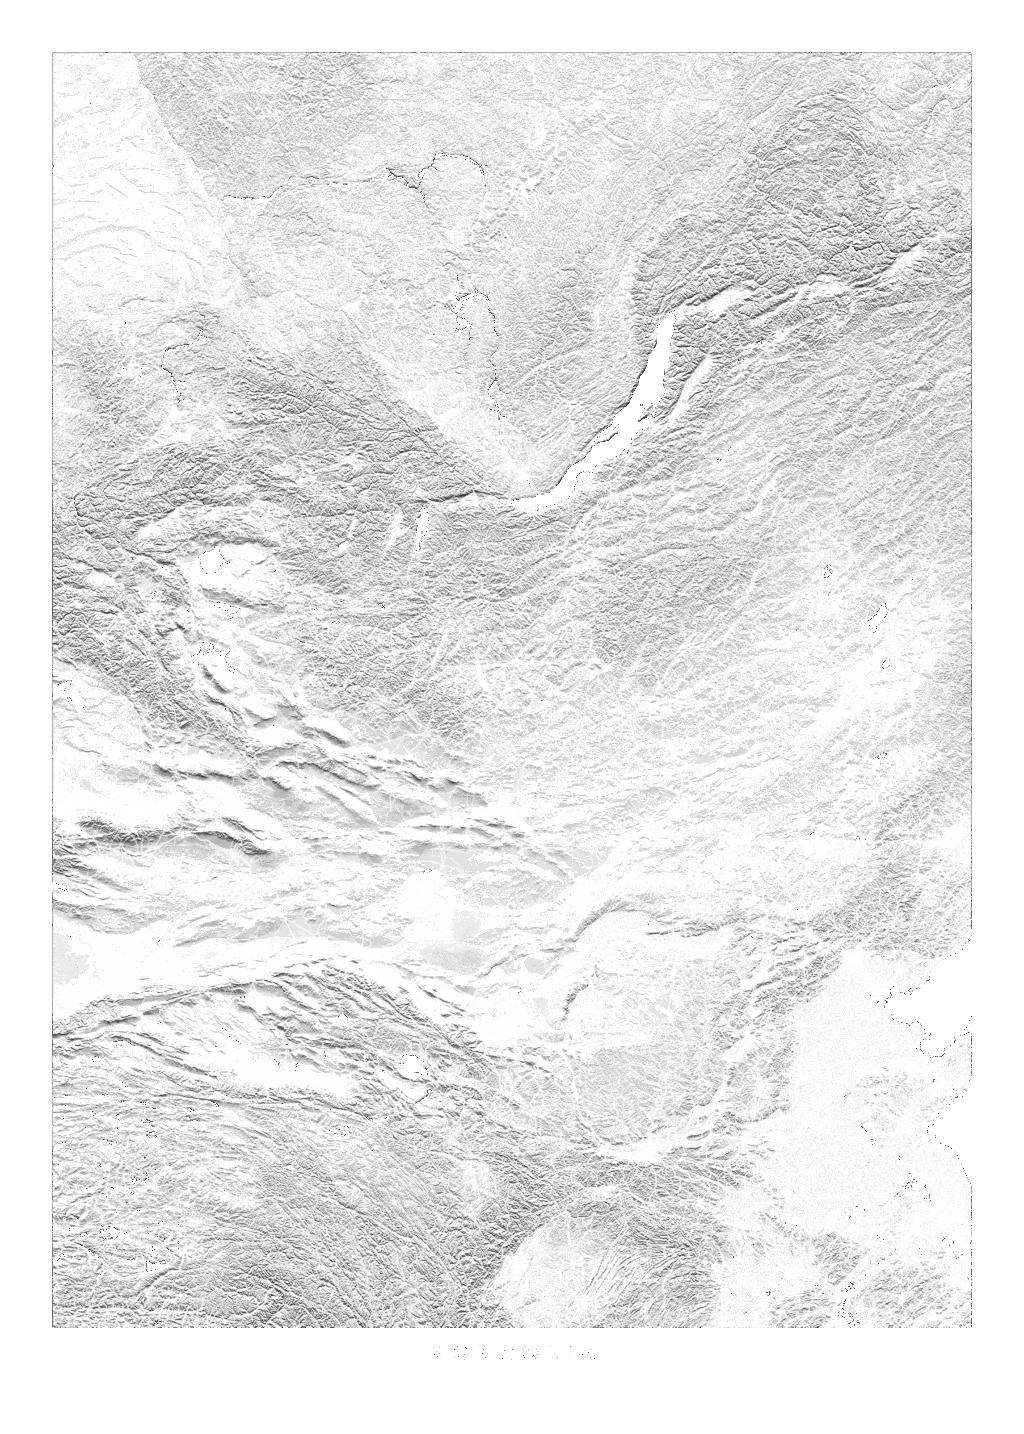 Mongolia wall map